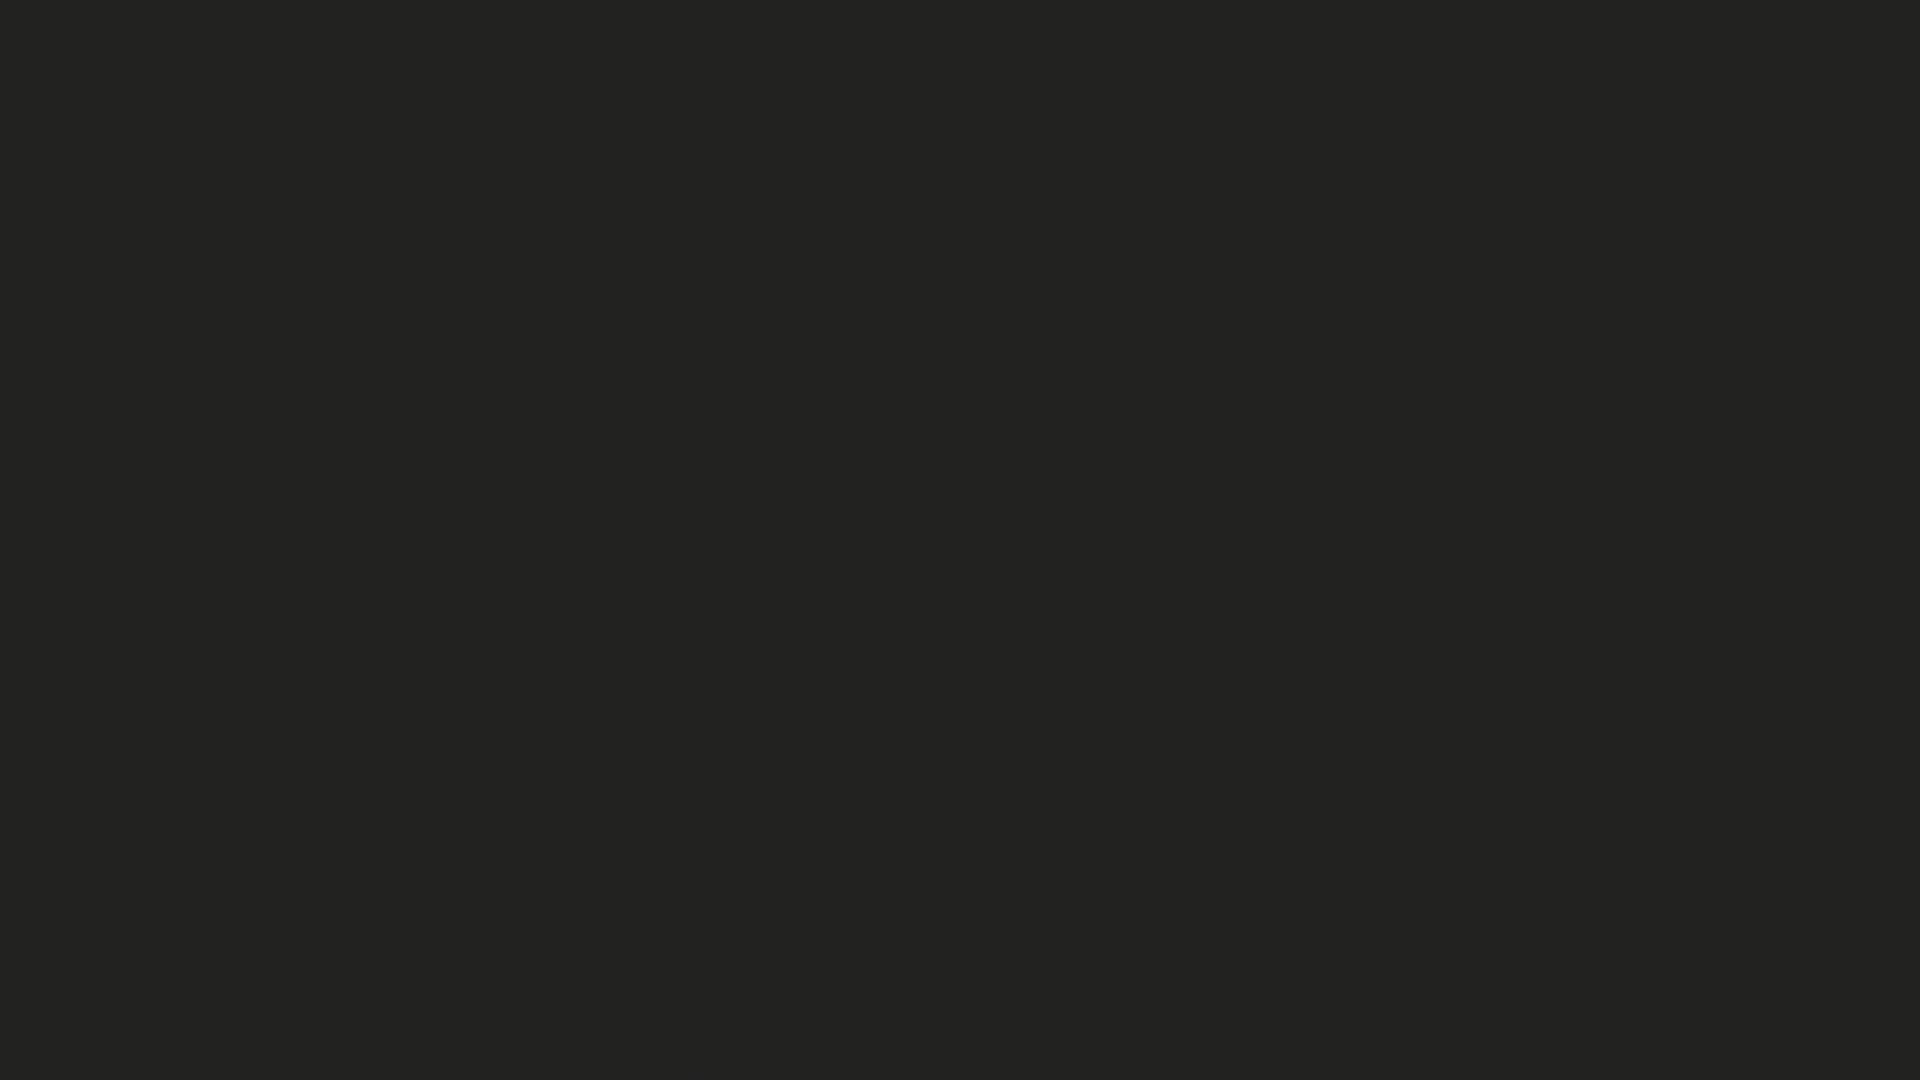 daily3d, scorpion-logo GIFs